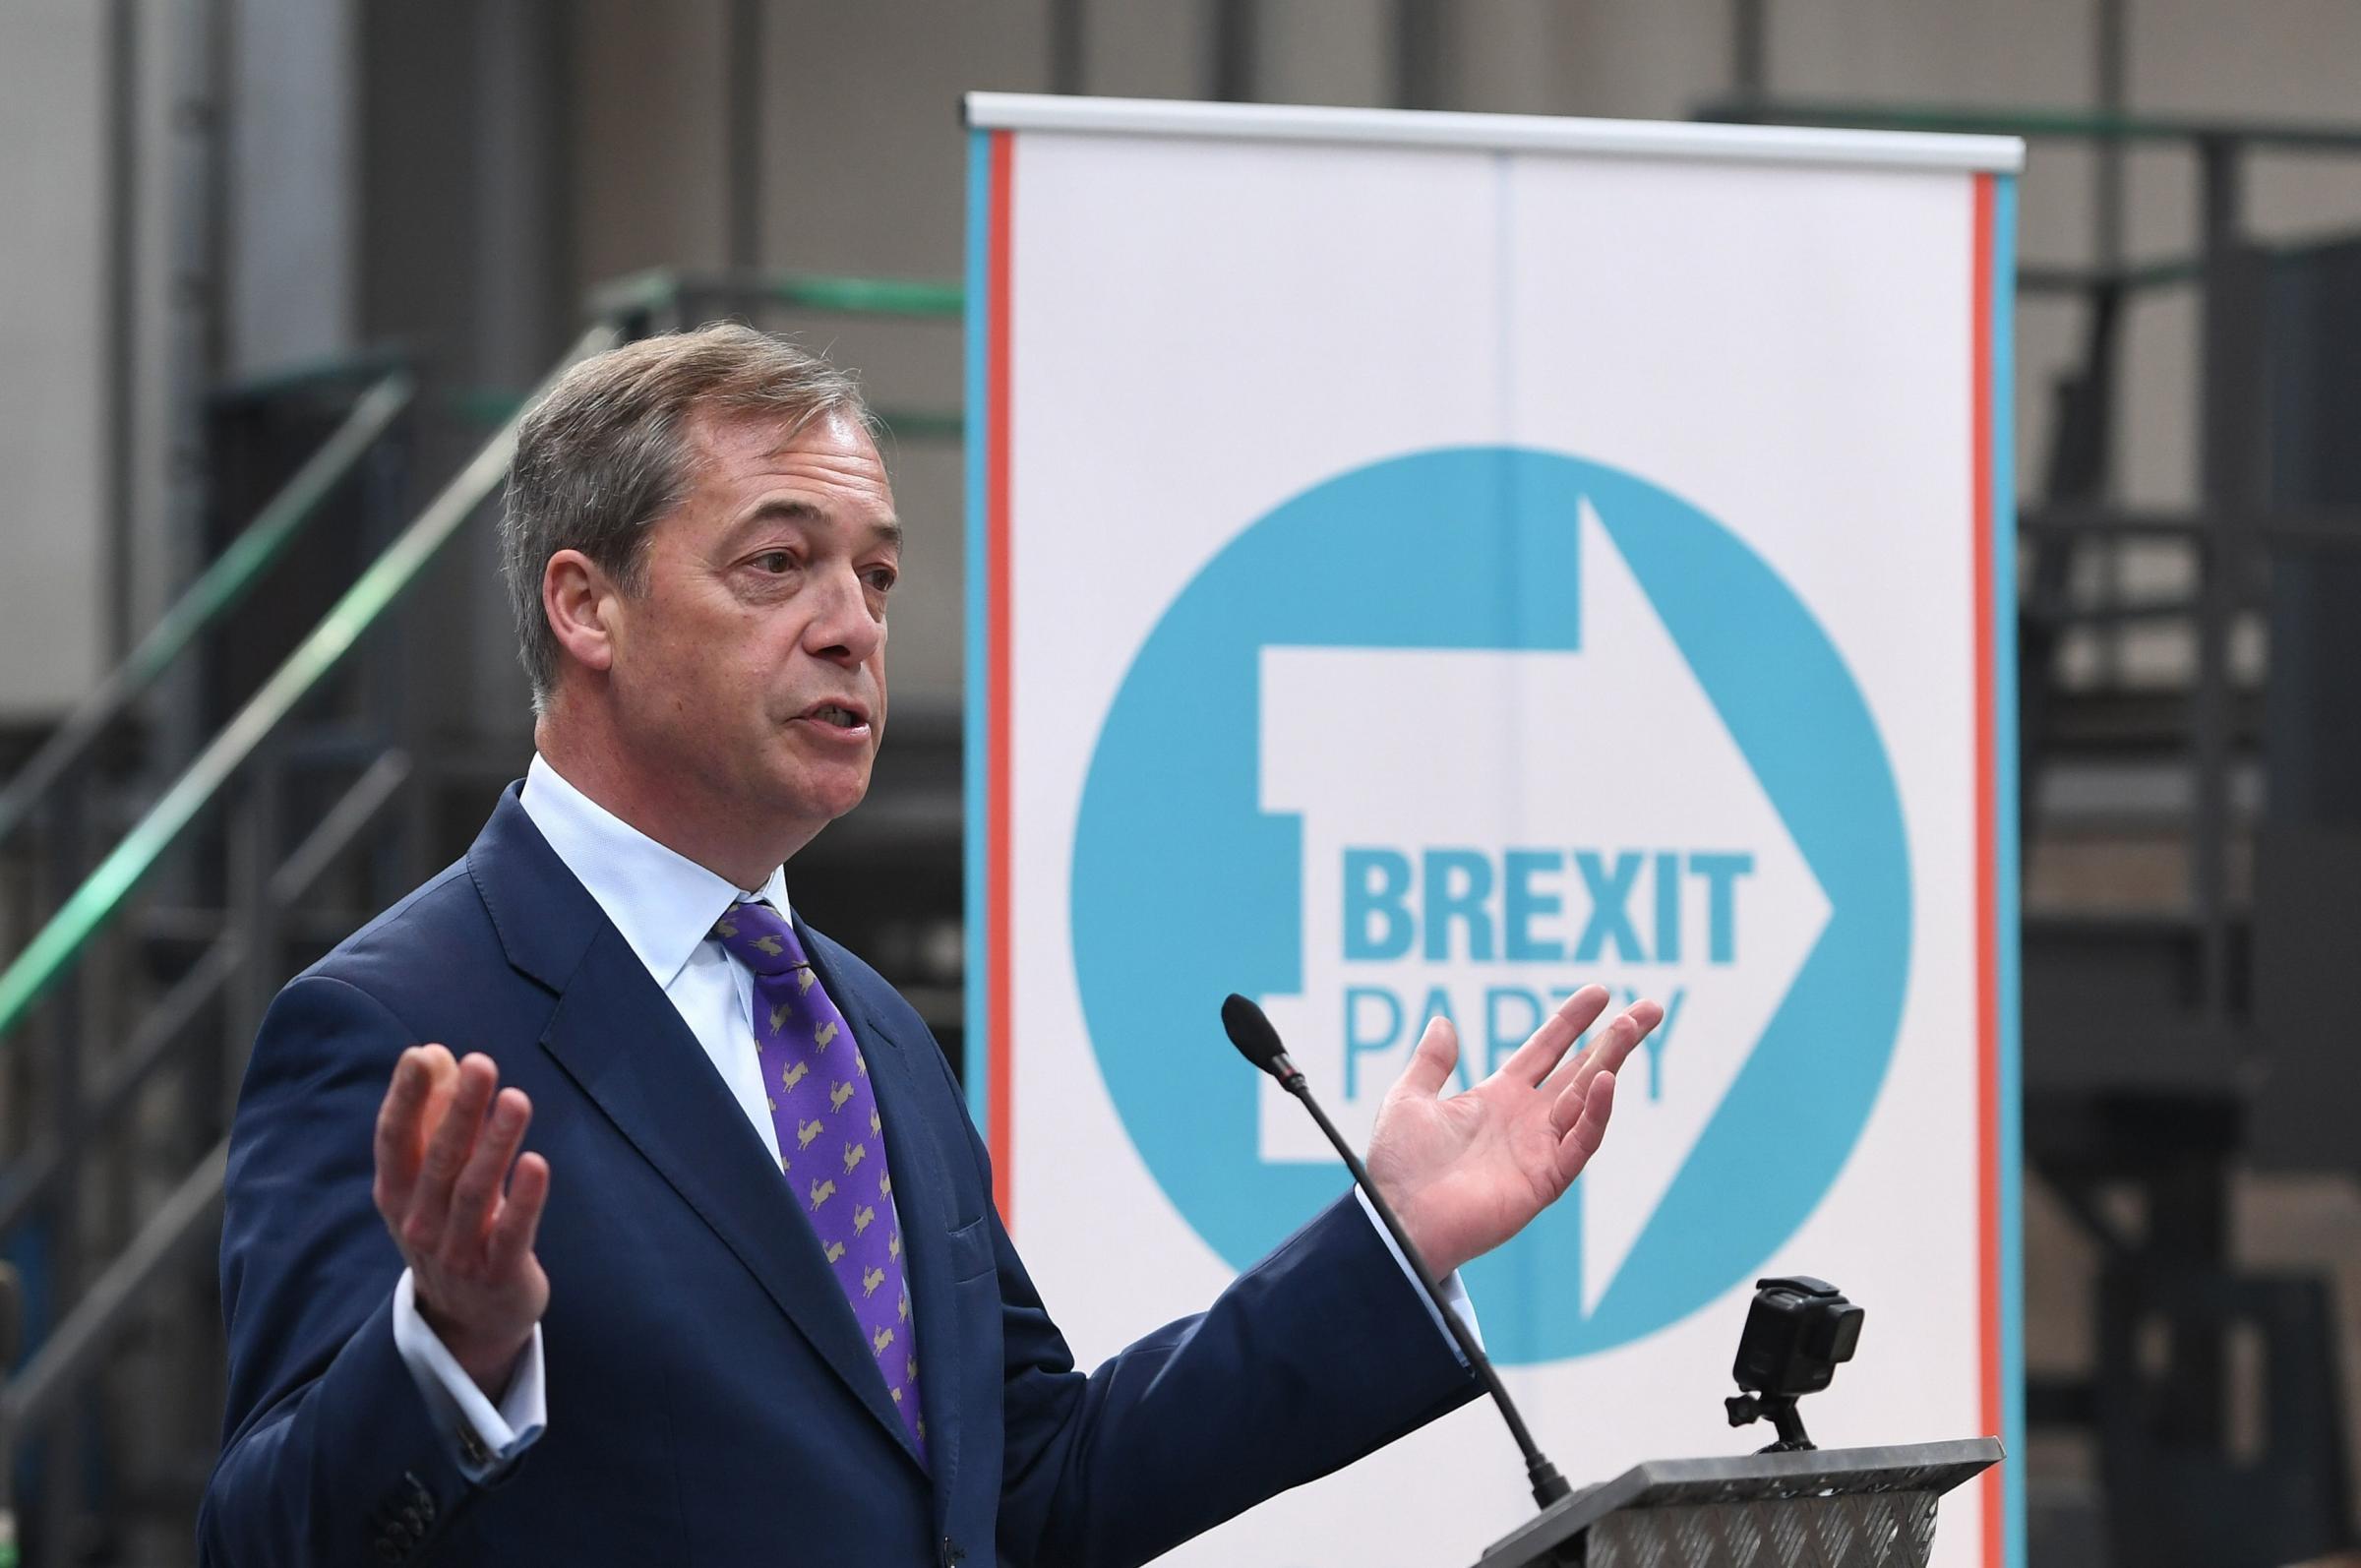 EU dream of Tusk may prove antidote for Farage's Brexit nightmare